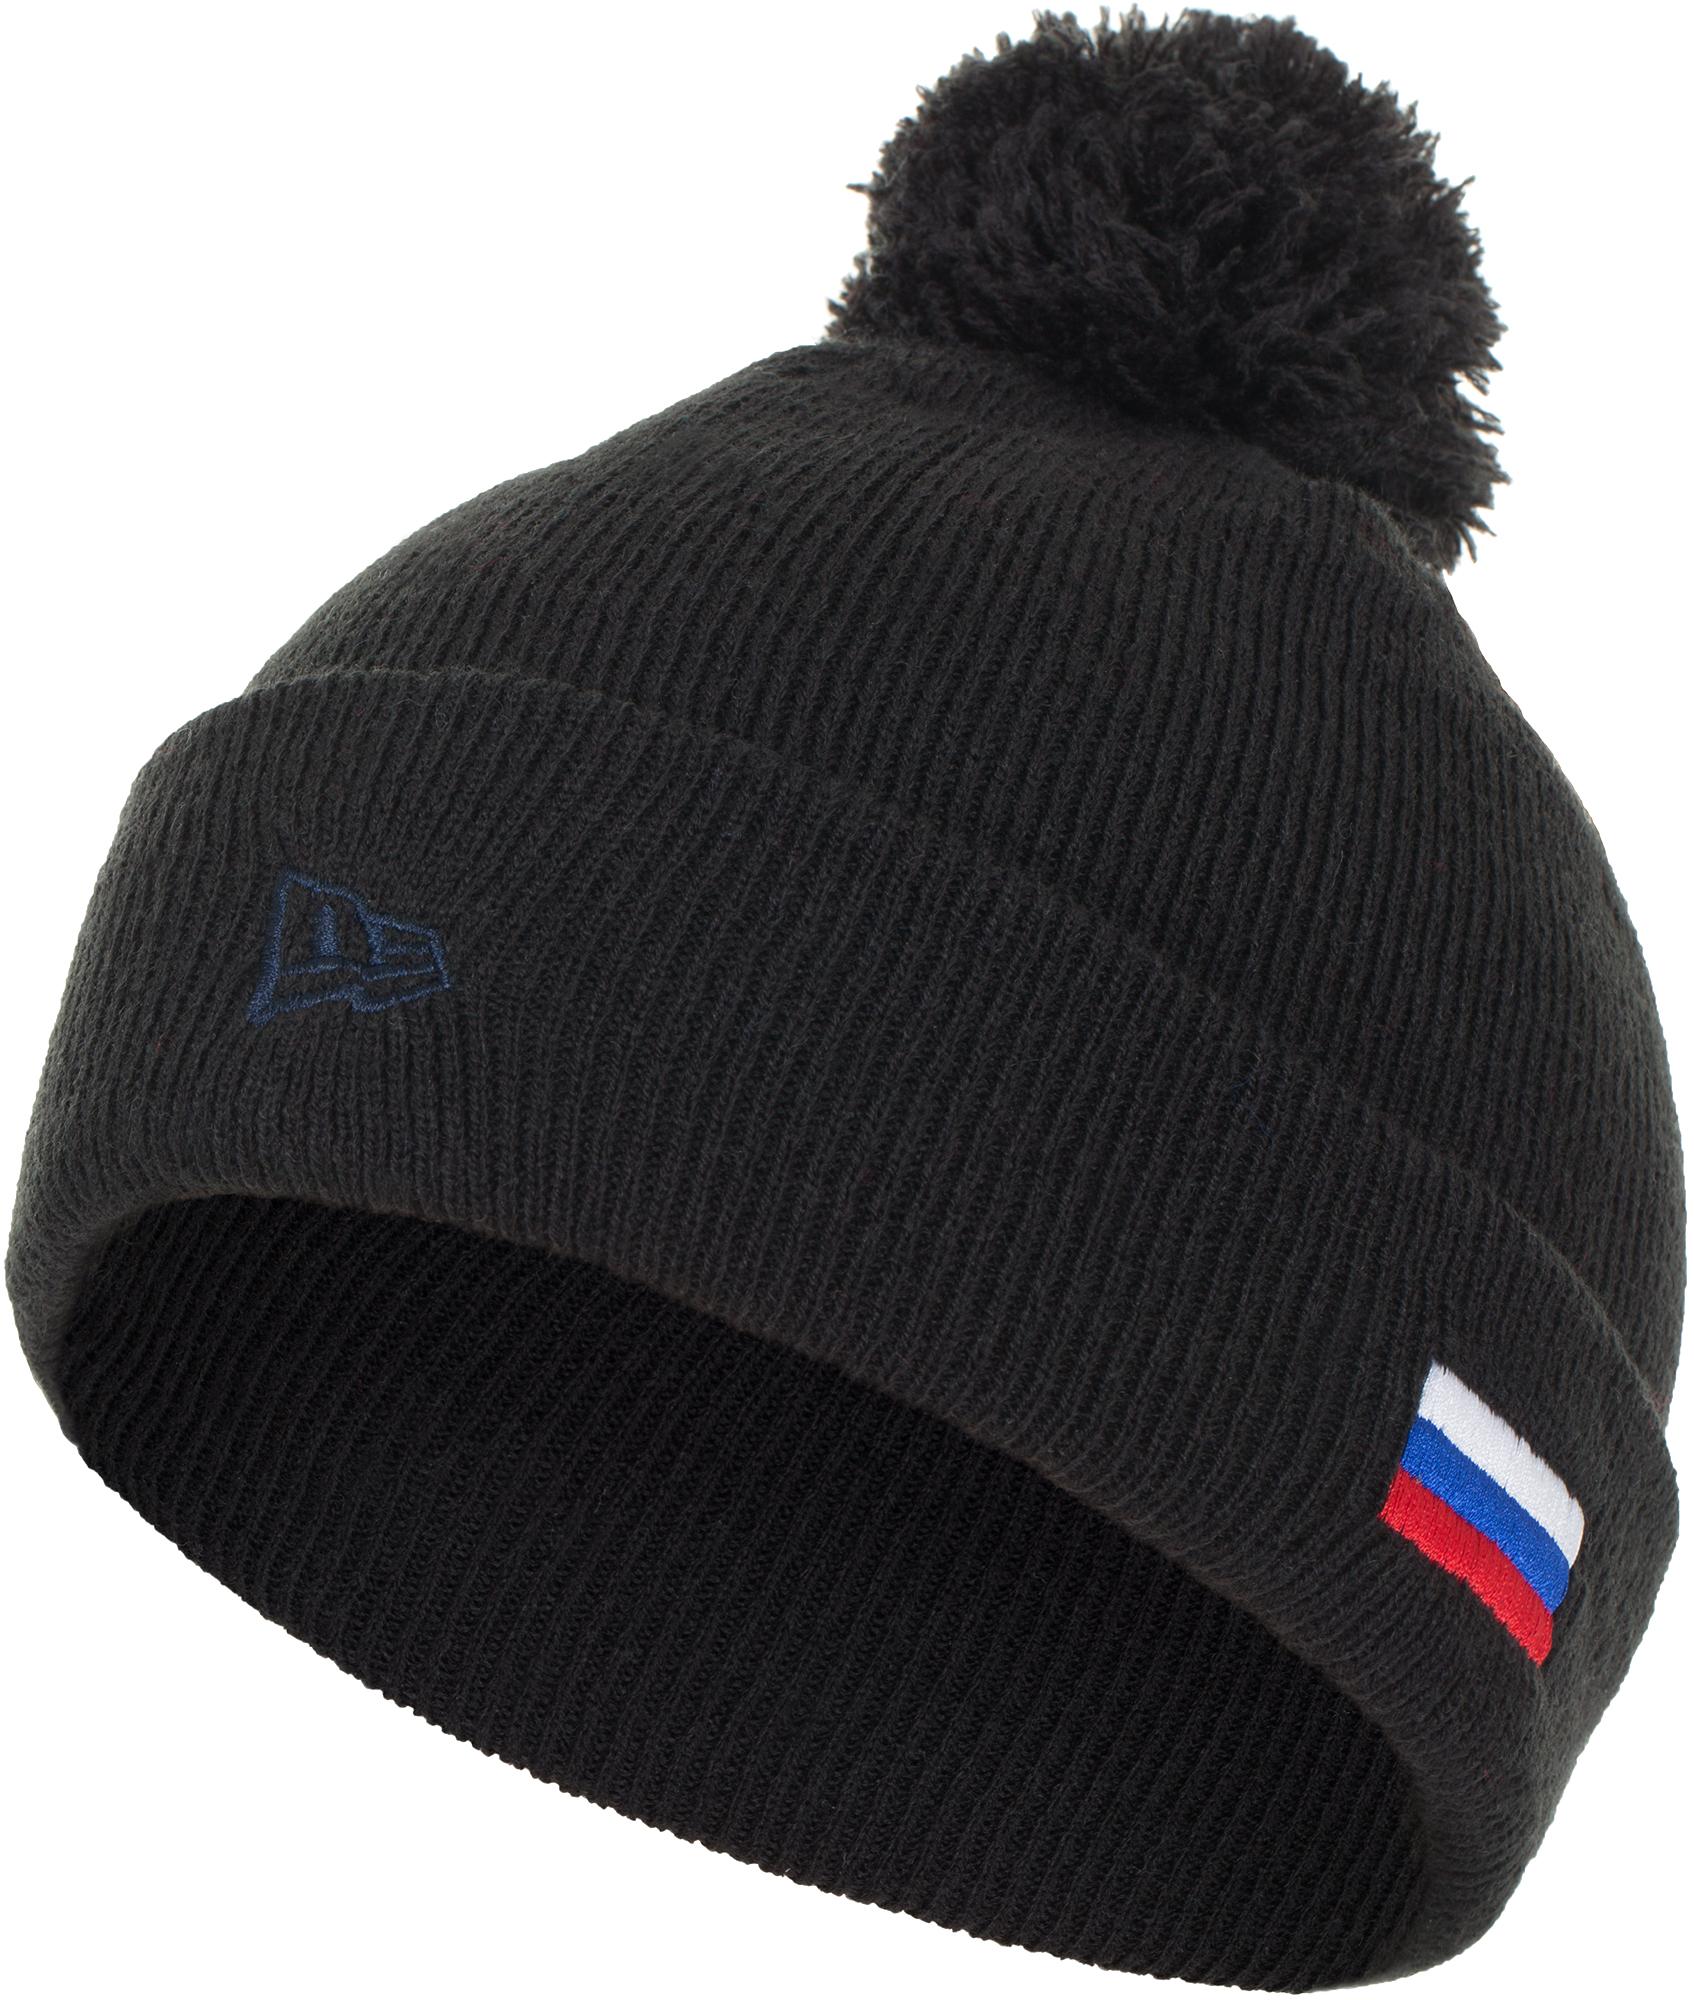 New Era Шапка для мальчиков Lic 879 Russian Bear Knit, размер 54-55